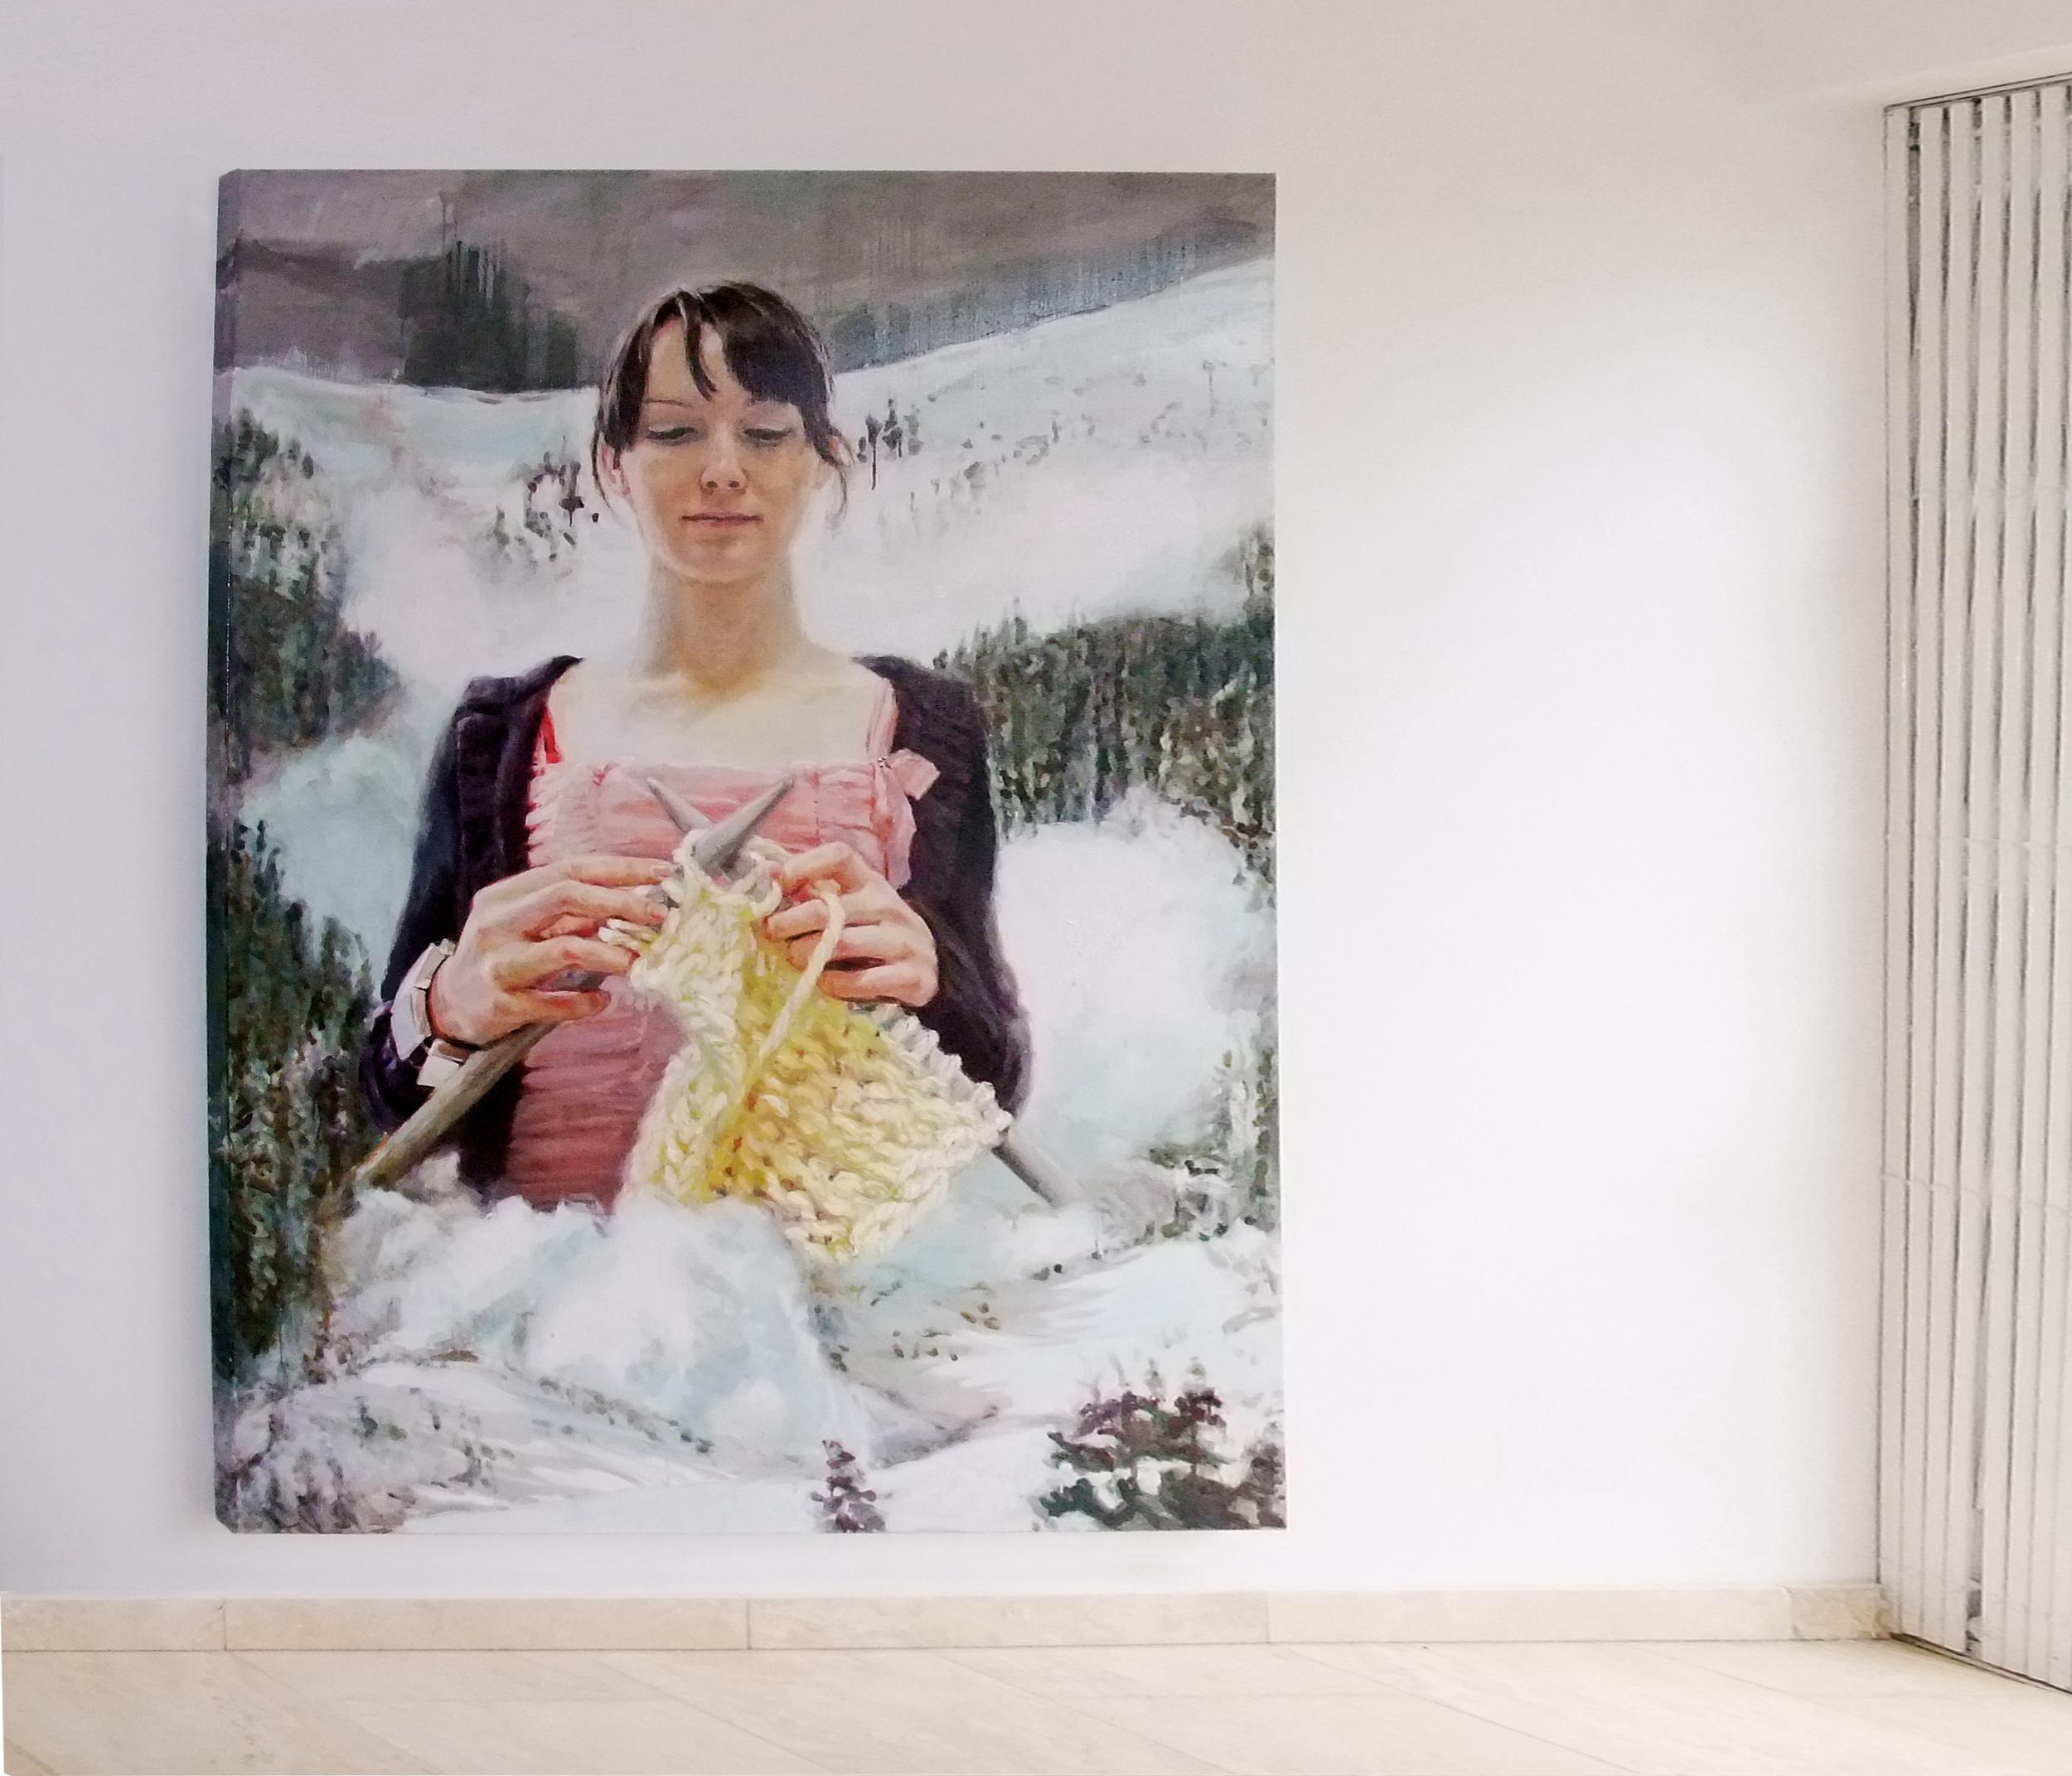 Aerfeldt Avalanche Knitter gallery